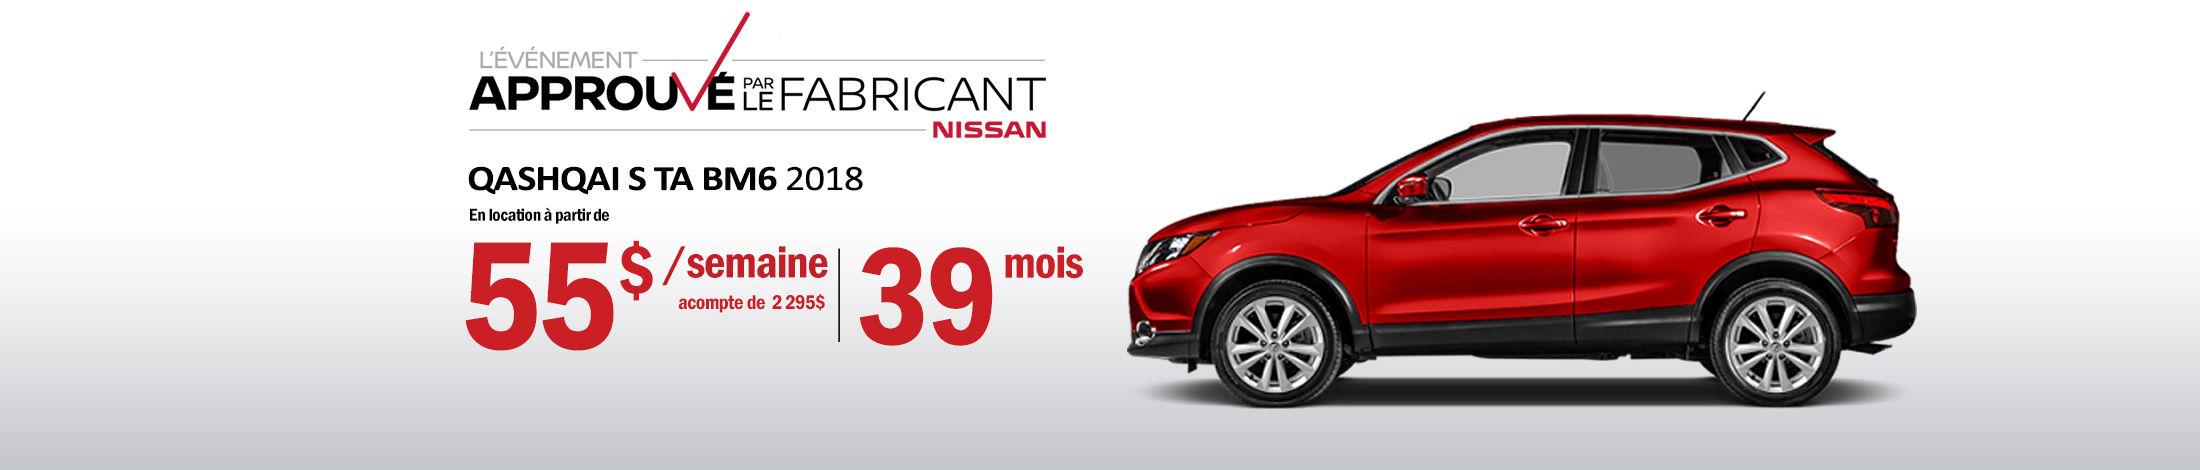 Nissan Qashqai promotion banner avril